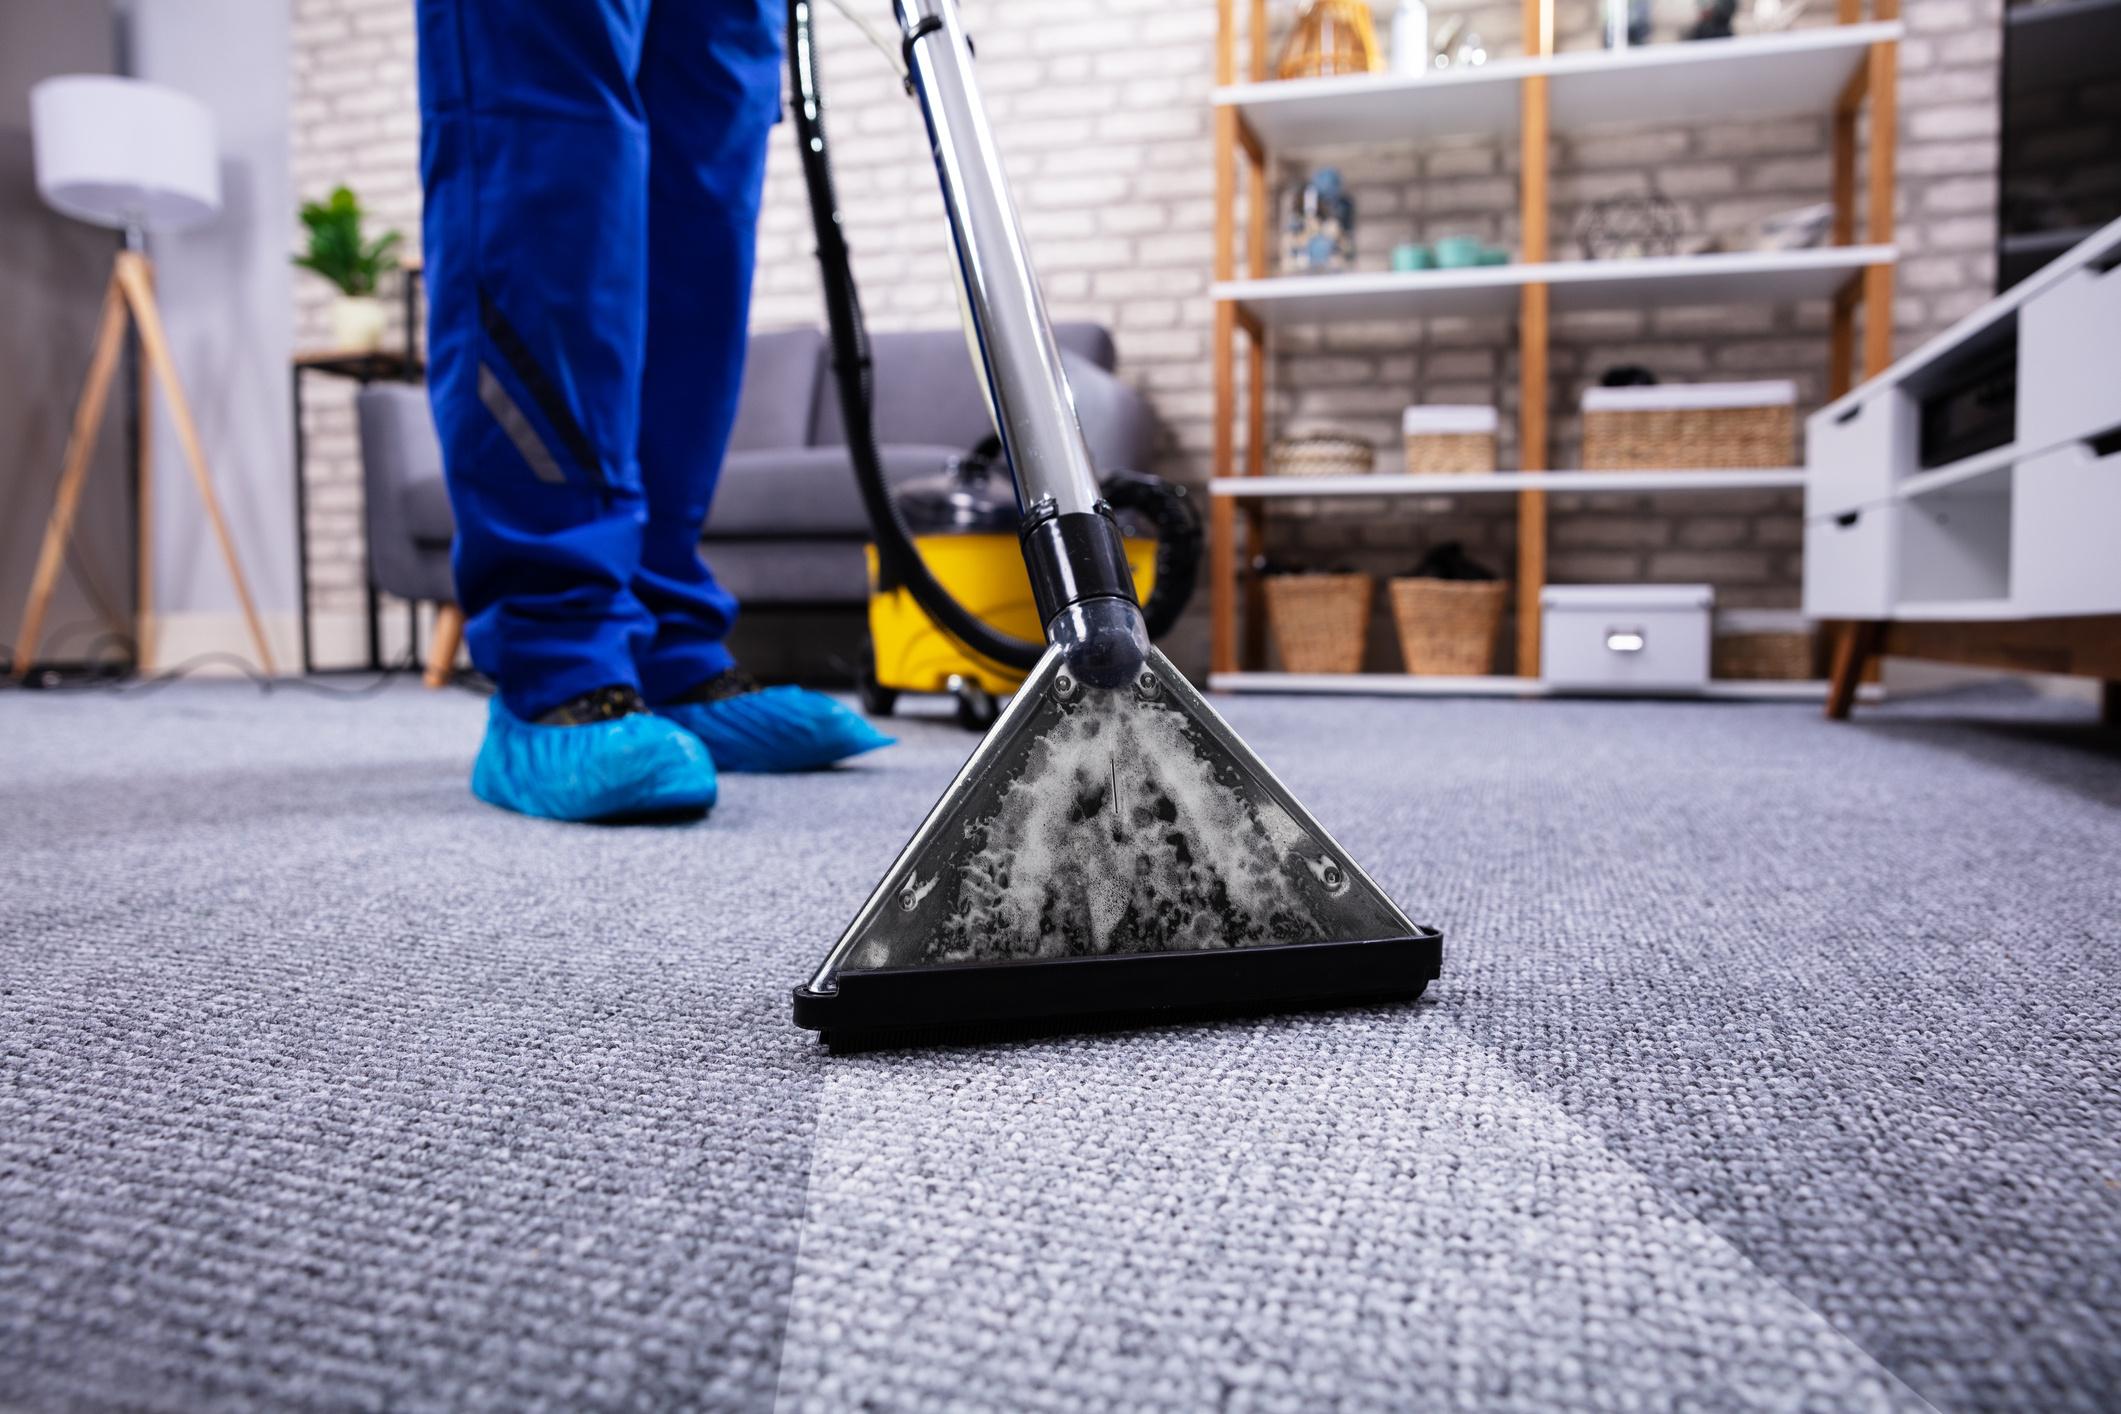 Profitable Carpet Cleaning/Repair Business Near The Beach!